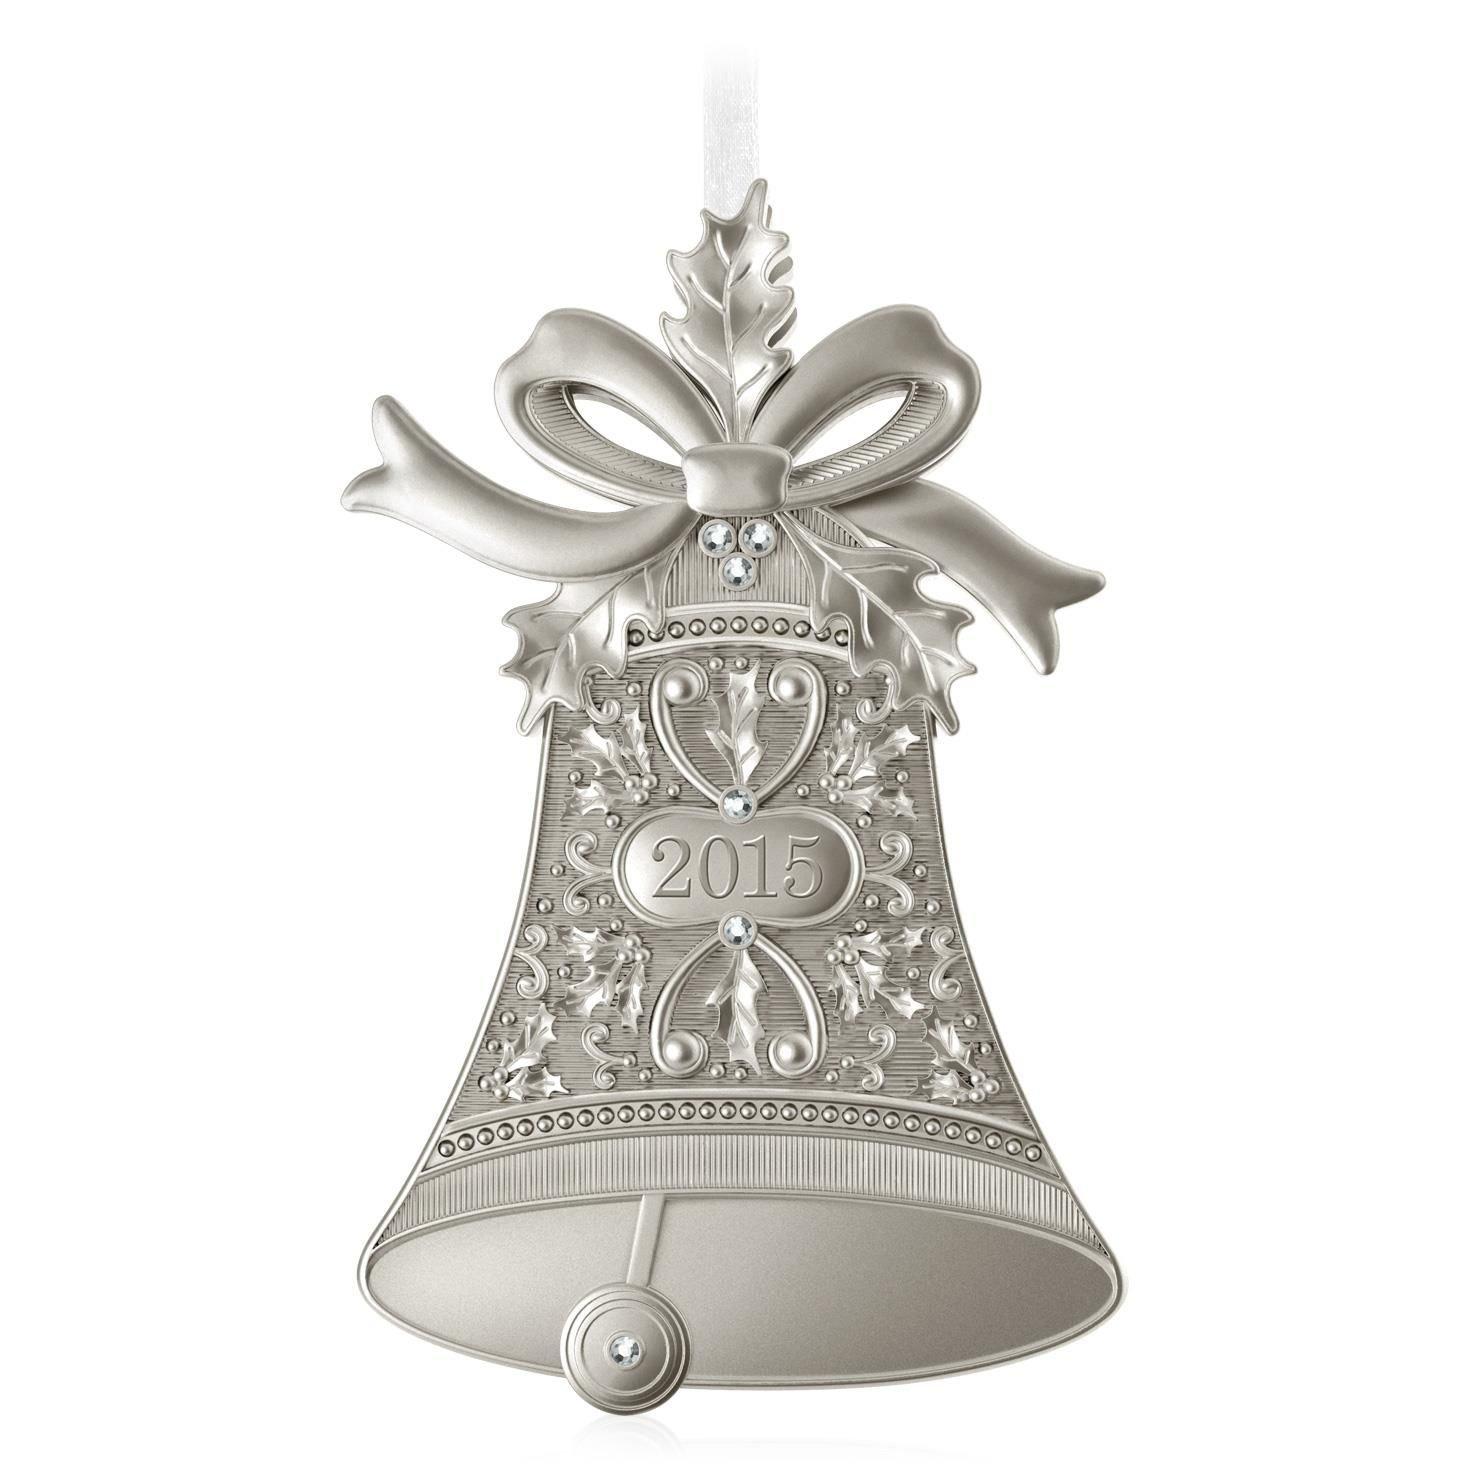 Hallmark QGO1577 Christmas Bells Ornament